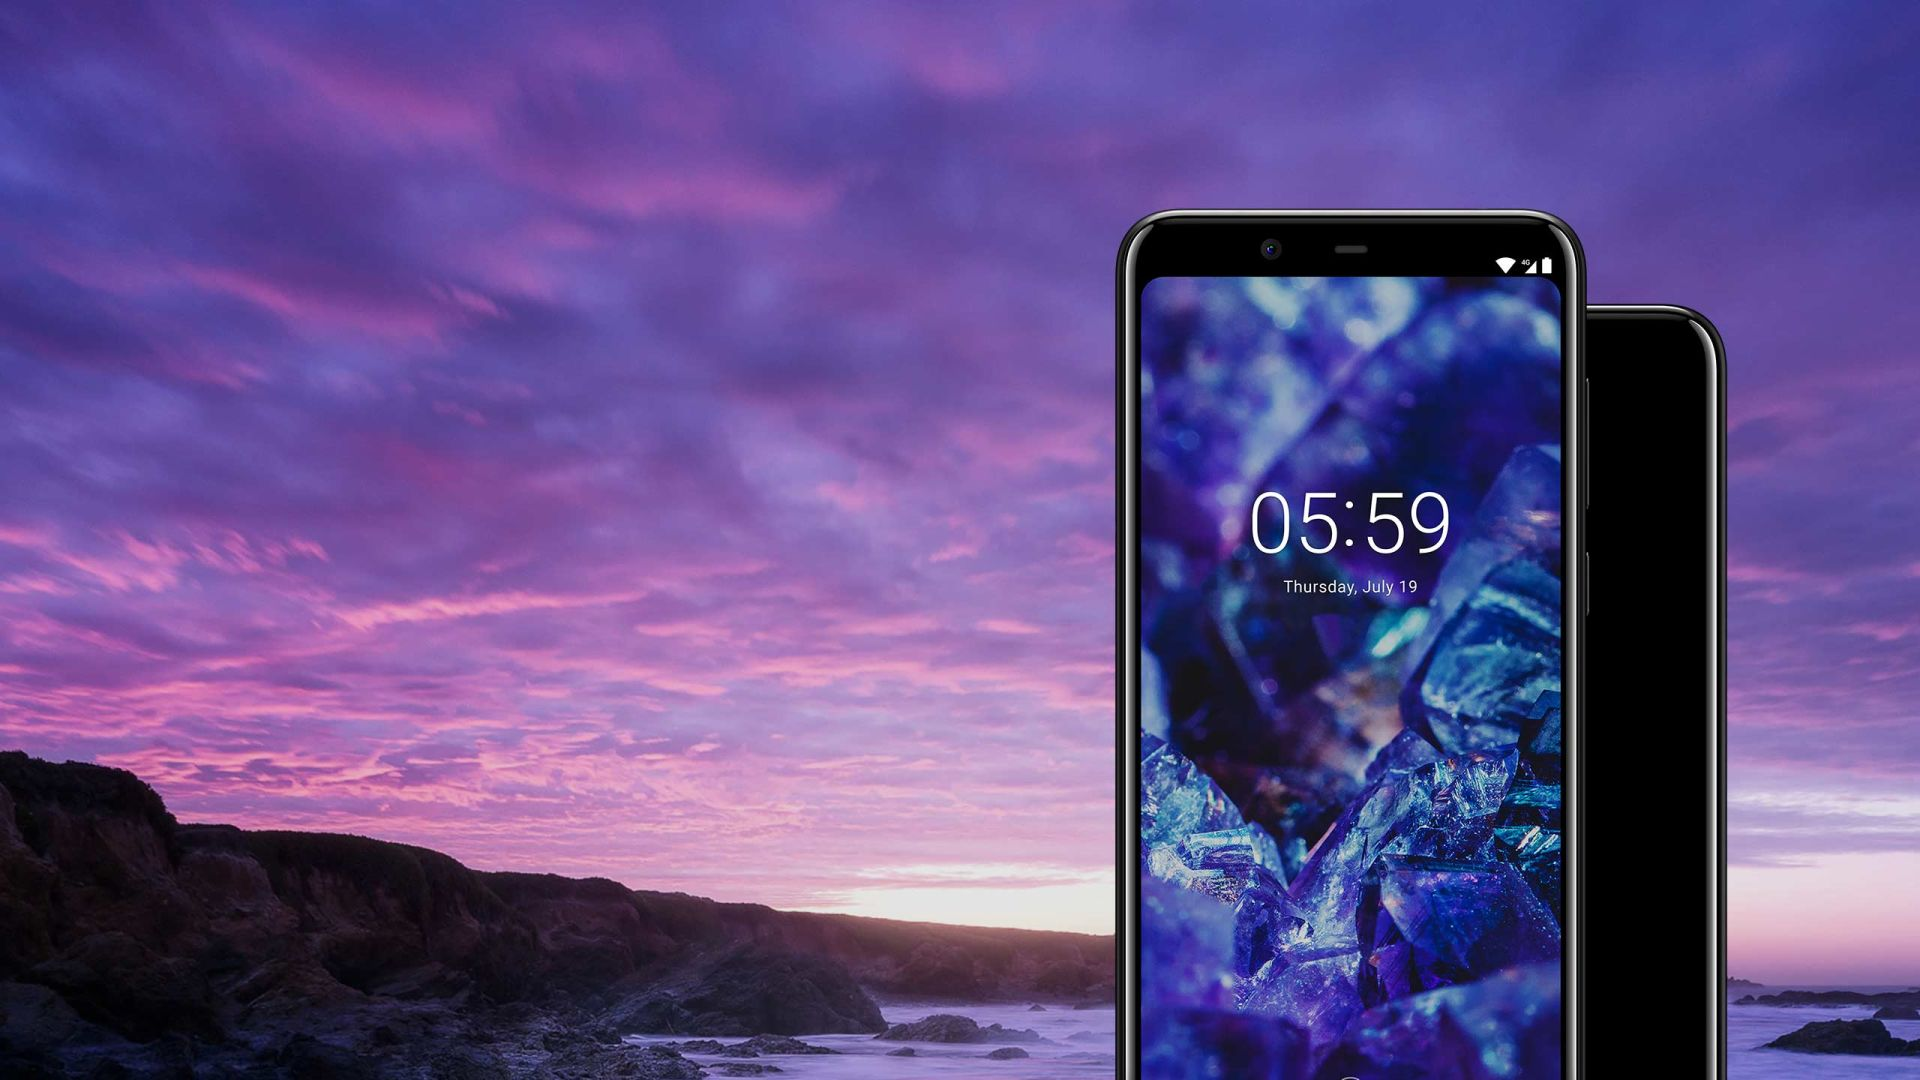 Oficiálně: Nokia 5.1 Plus a Nokia 6.1 Plus